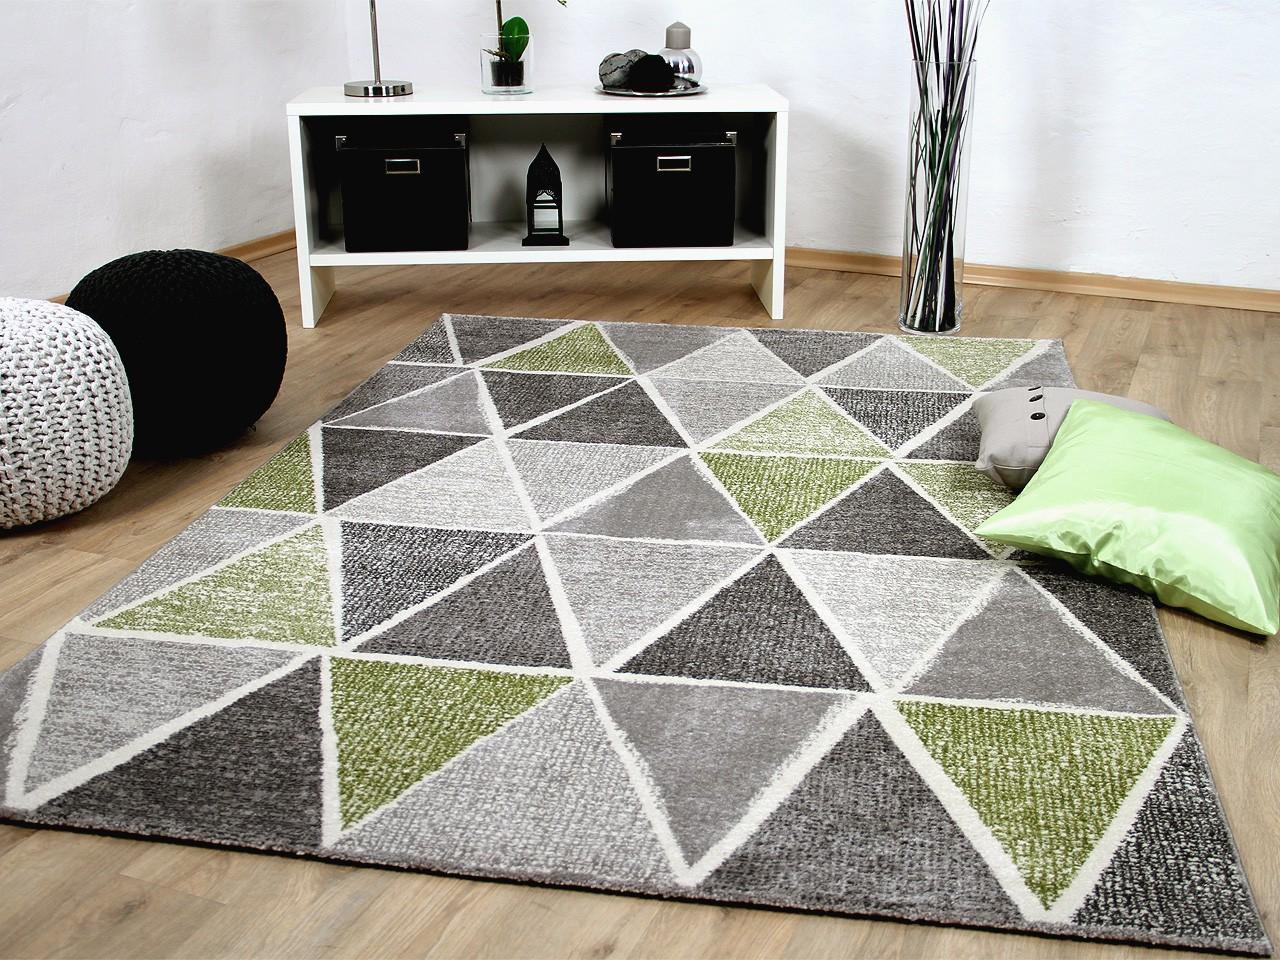 Designer teppich sevilla modern grau gr n prisma kaufen - Teppich modern grau ...